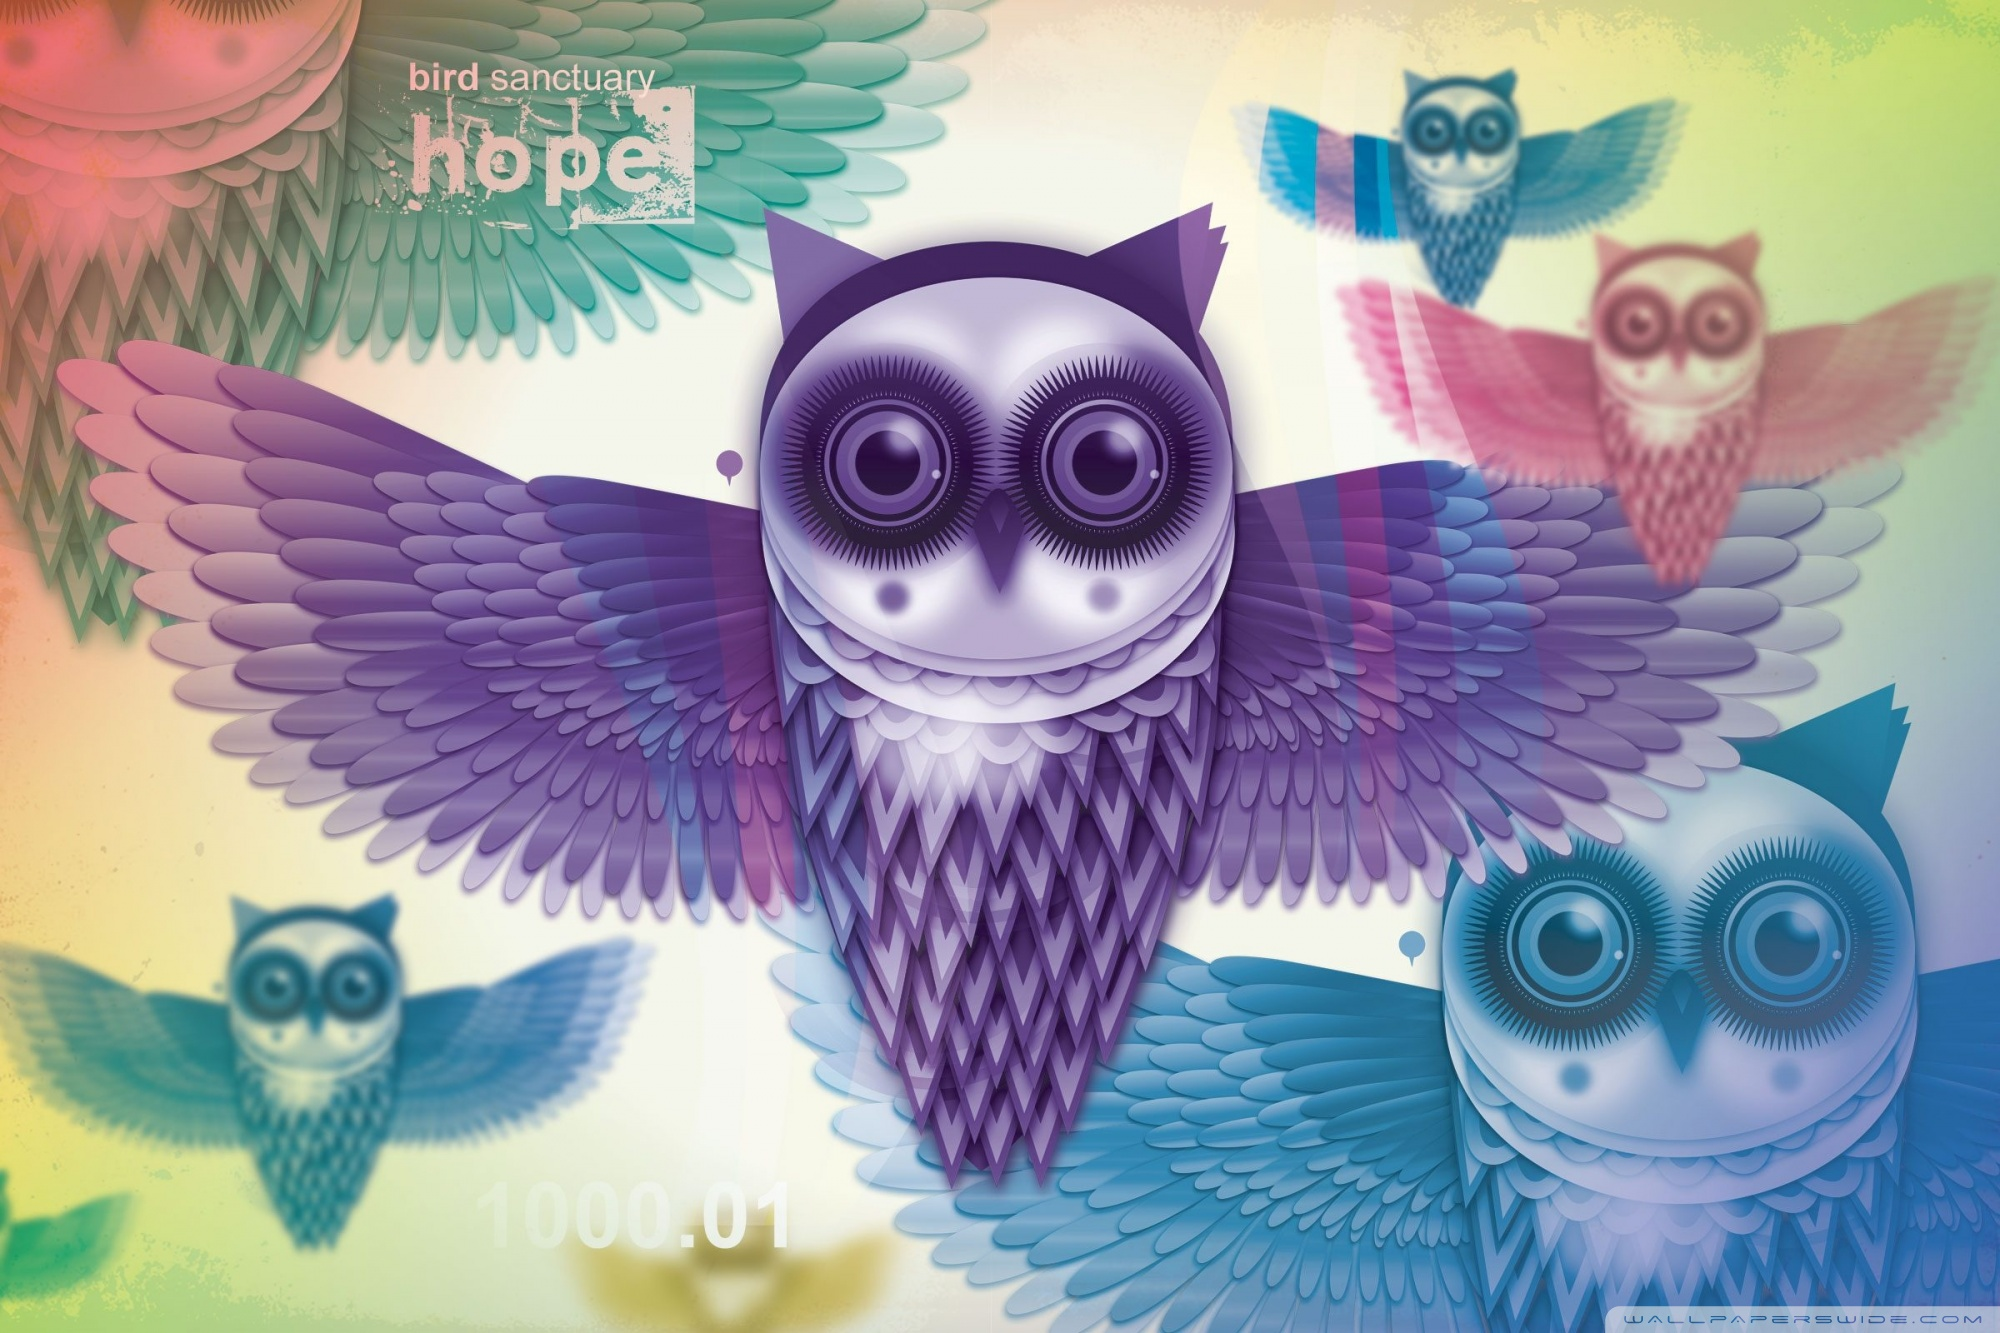 Cute Owl For Ipad Wallpaper Desktop Cute Desktop Backgrounds 2000x1333 Download Hd Wallpaper Wallpapertip